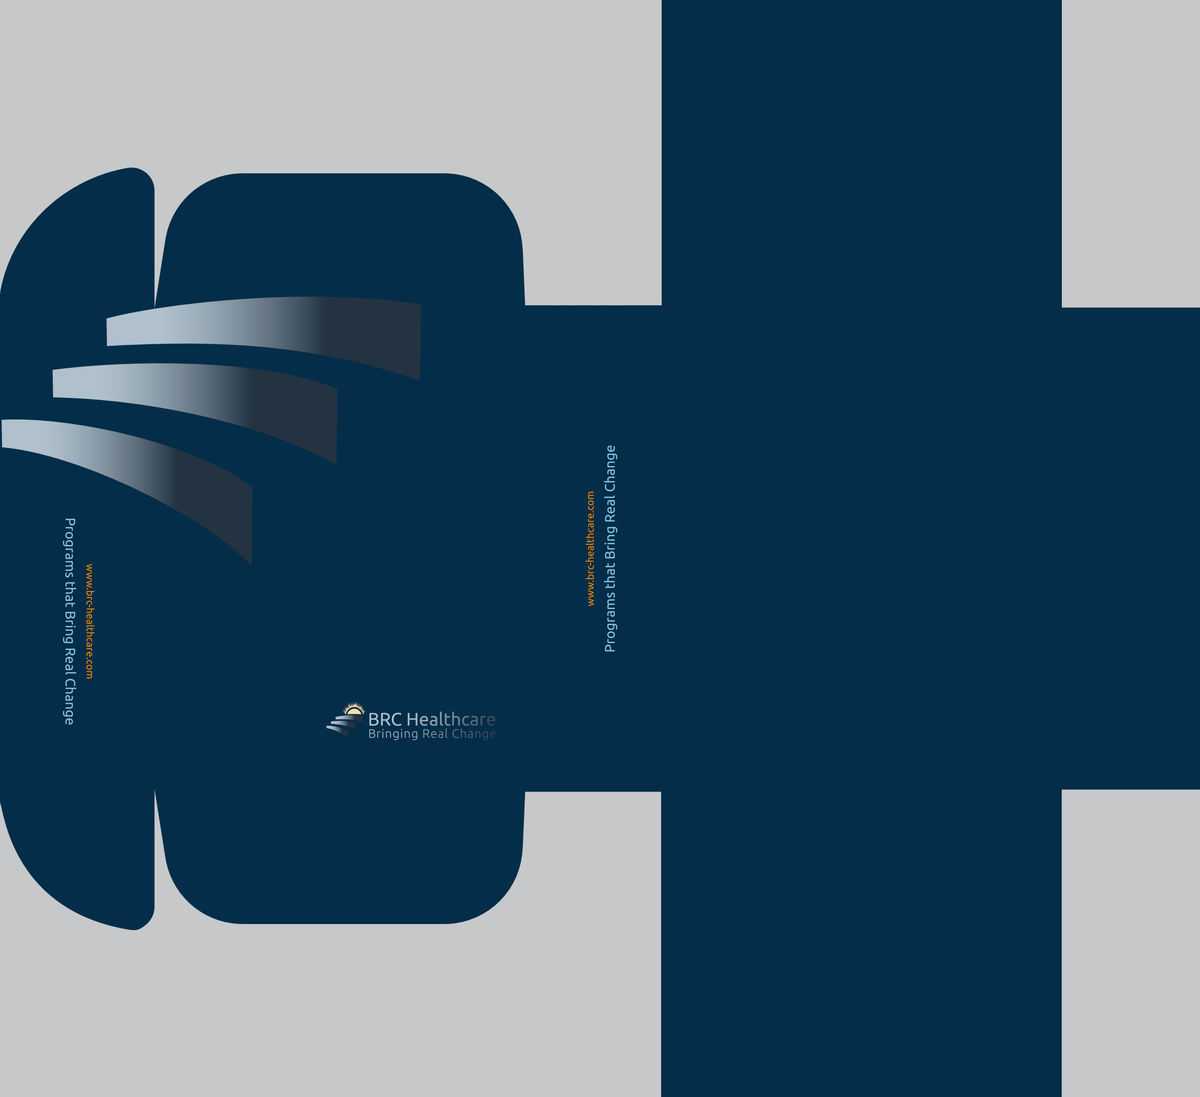 Packaging design for BRC Healthcare